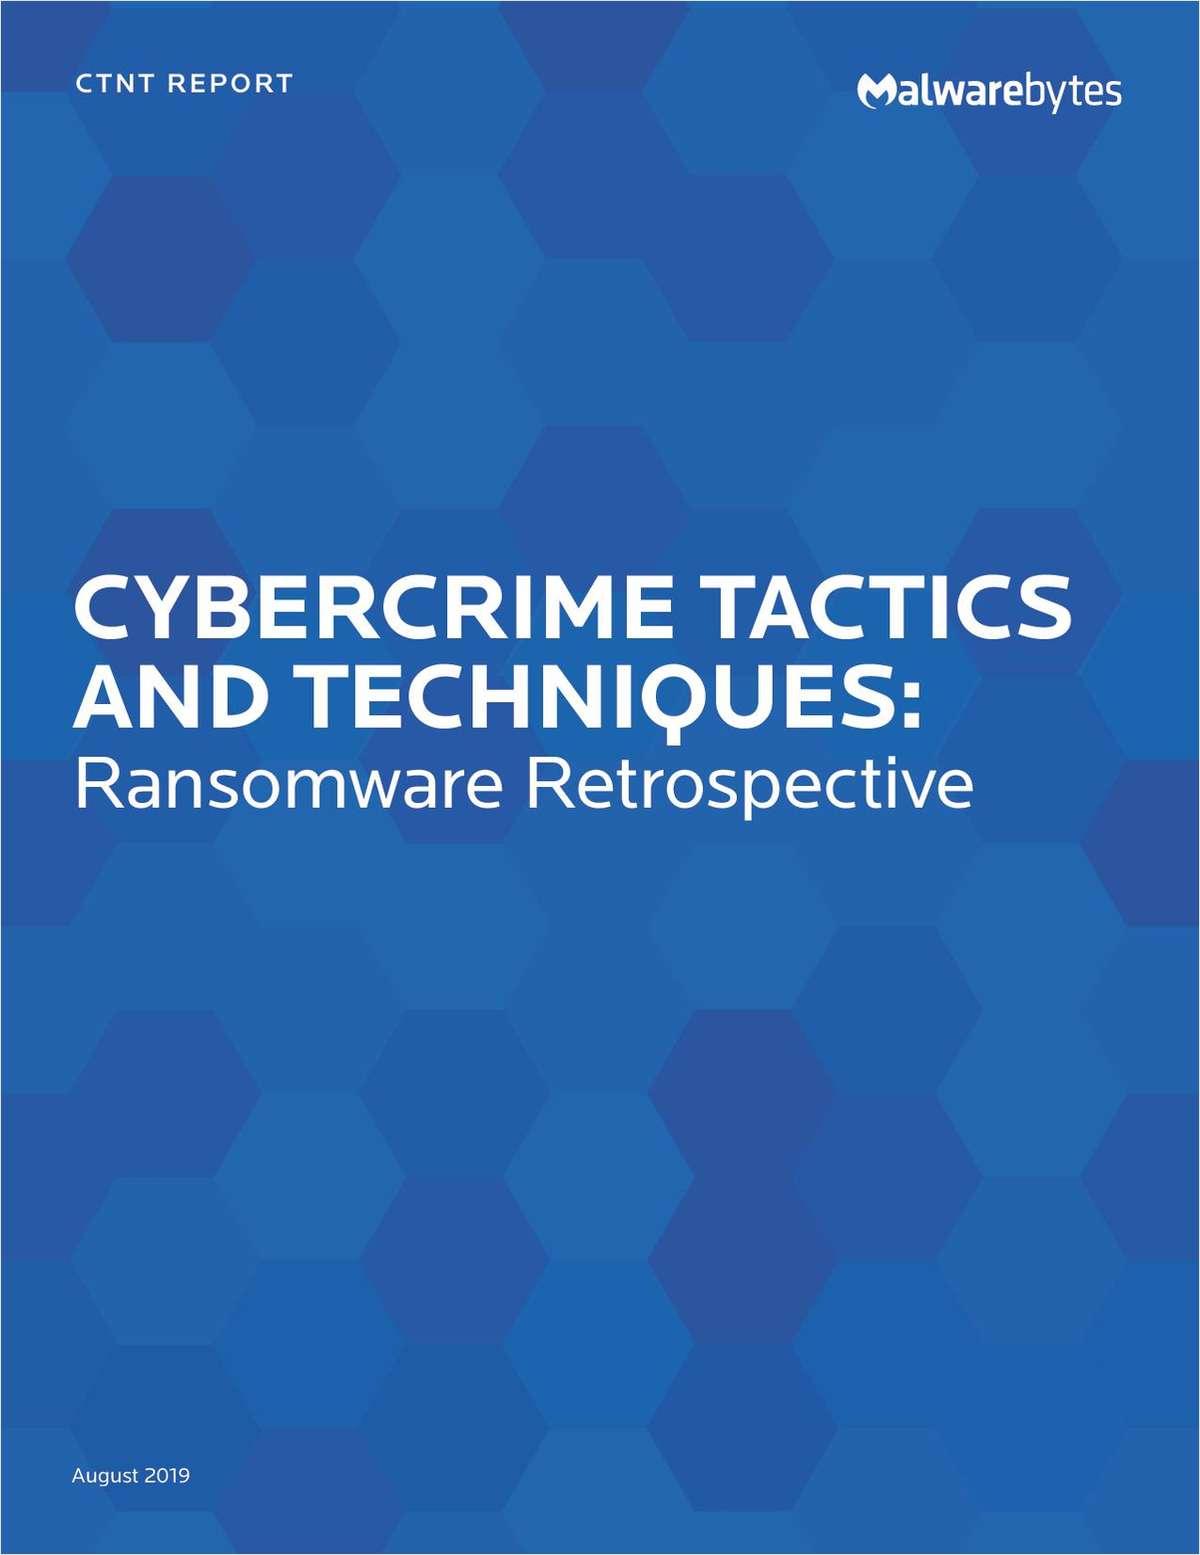 Cybercrime Tactics and Techniques: Ransomware Retrospective